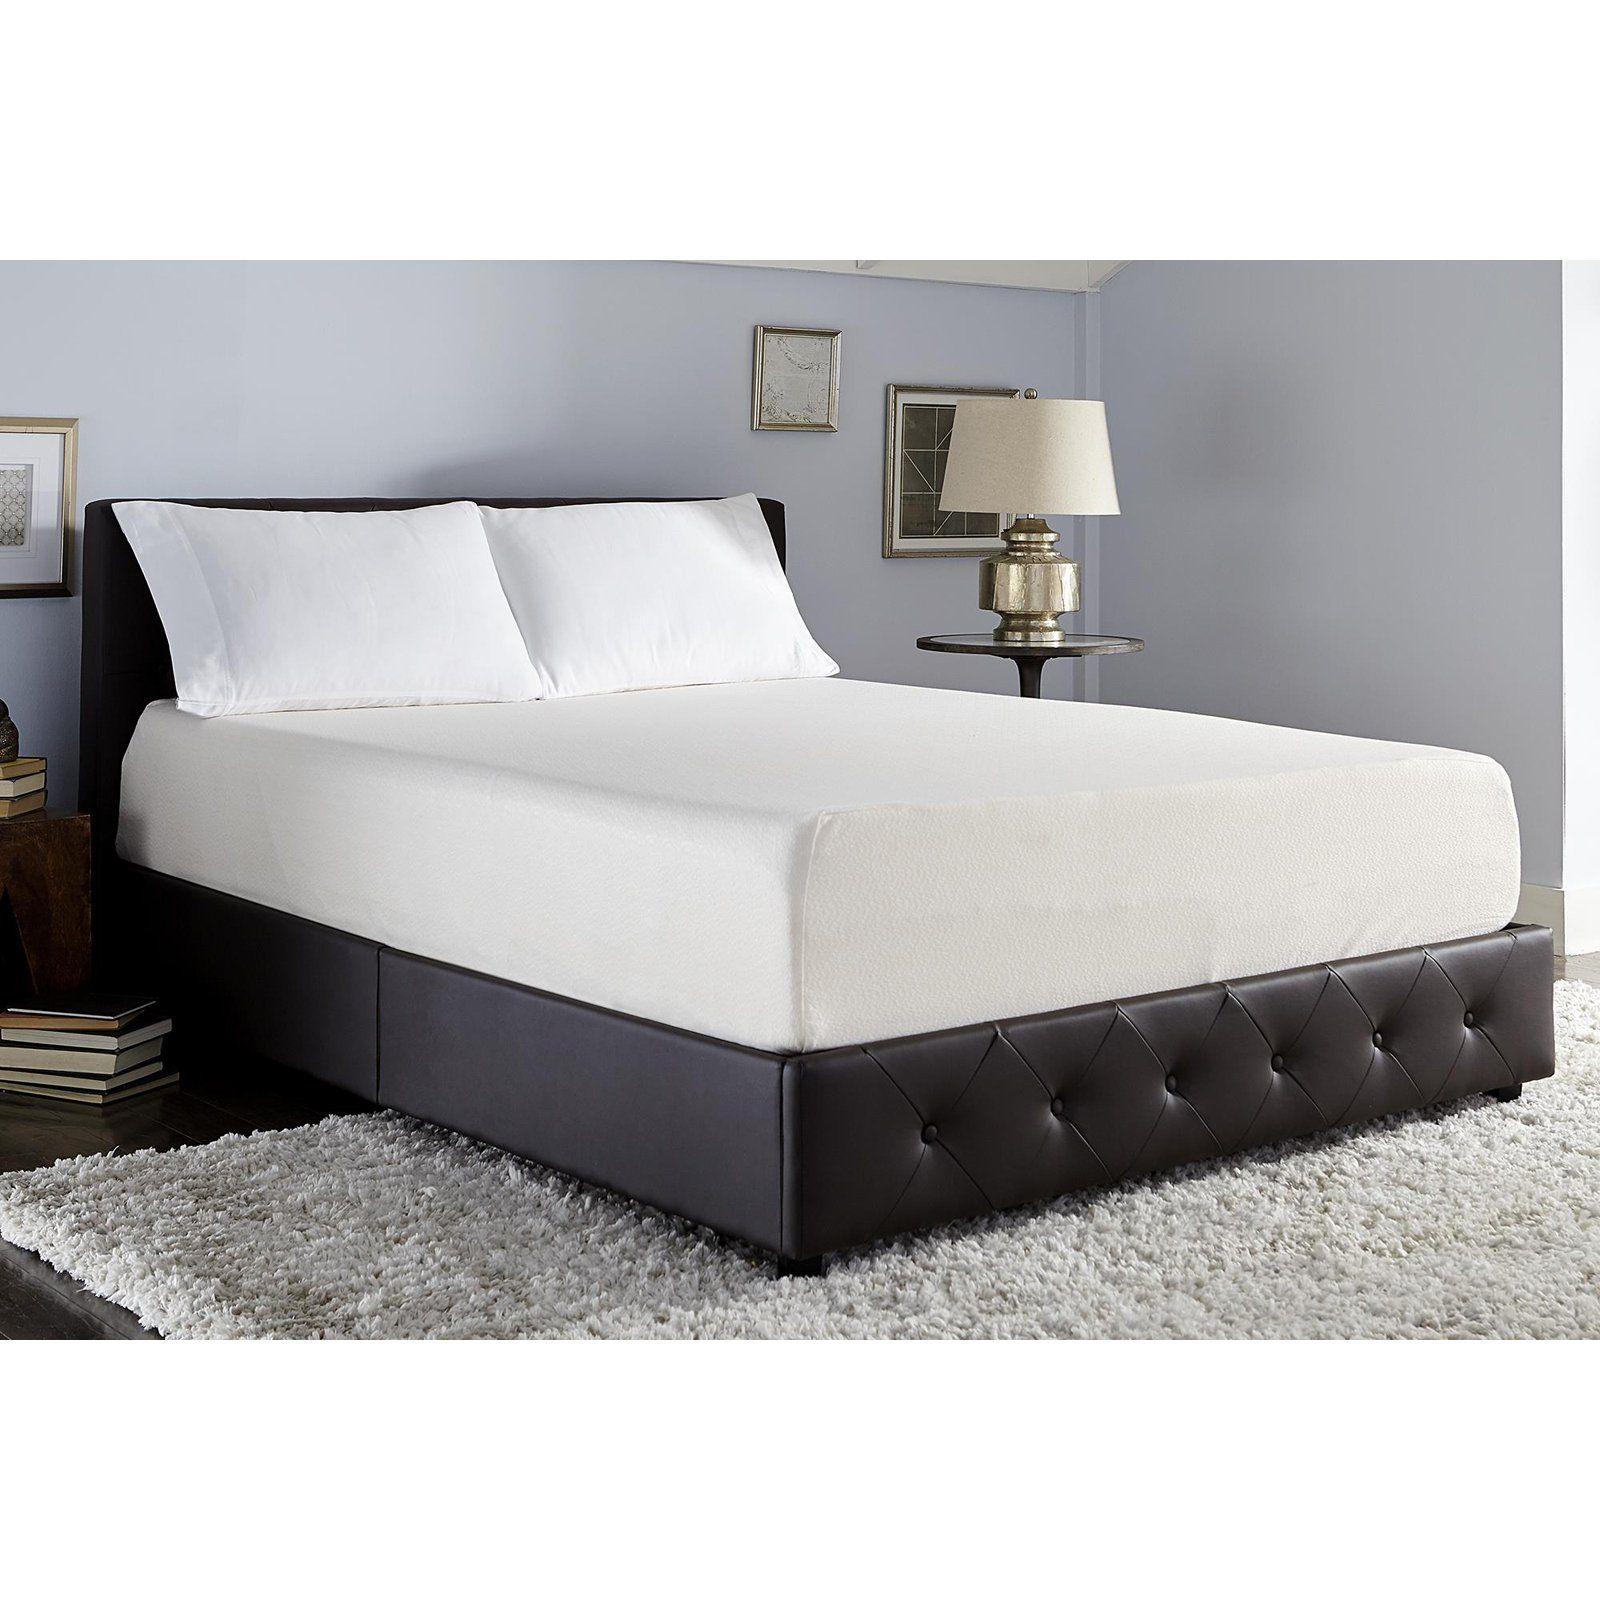 signature sleep memoir 12 inch mattress 5475096 products